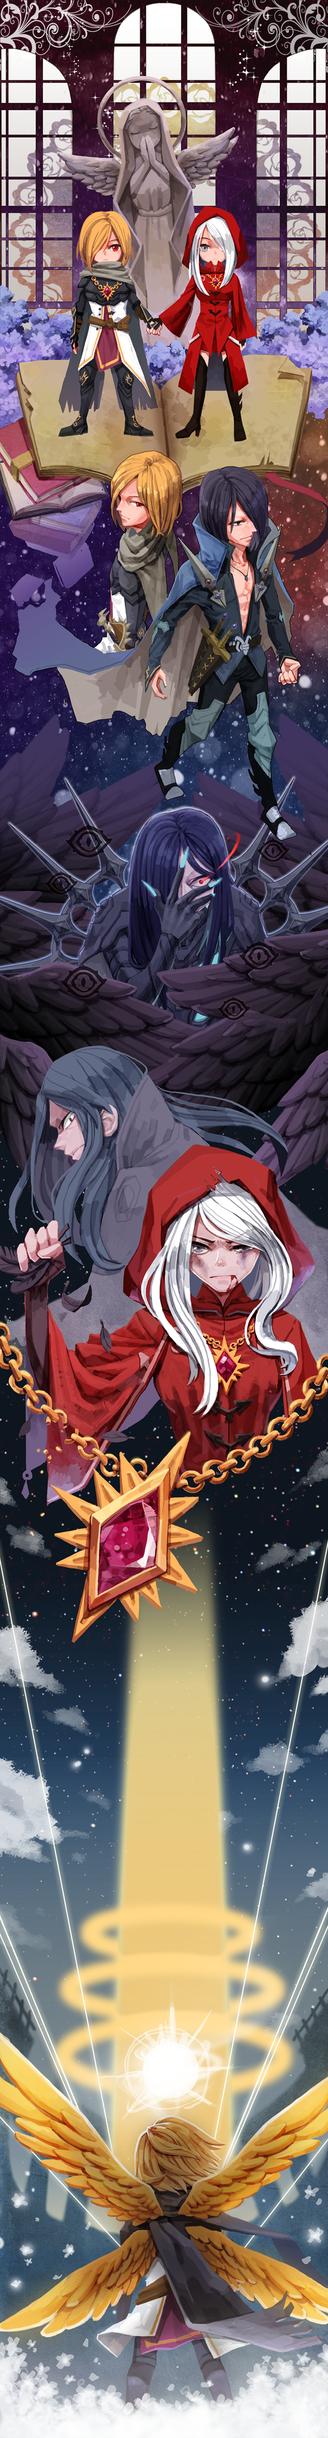 3 Dragons by gonggongee